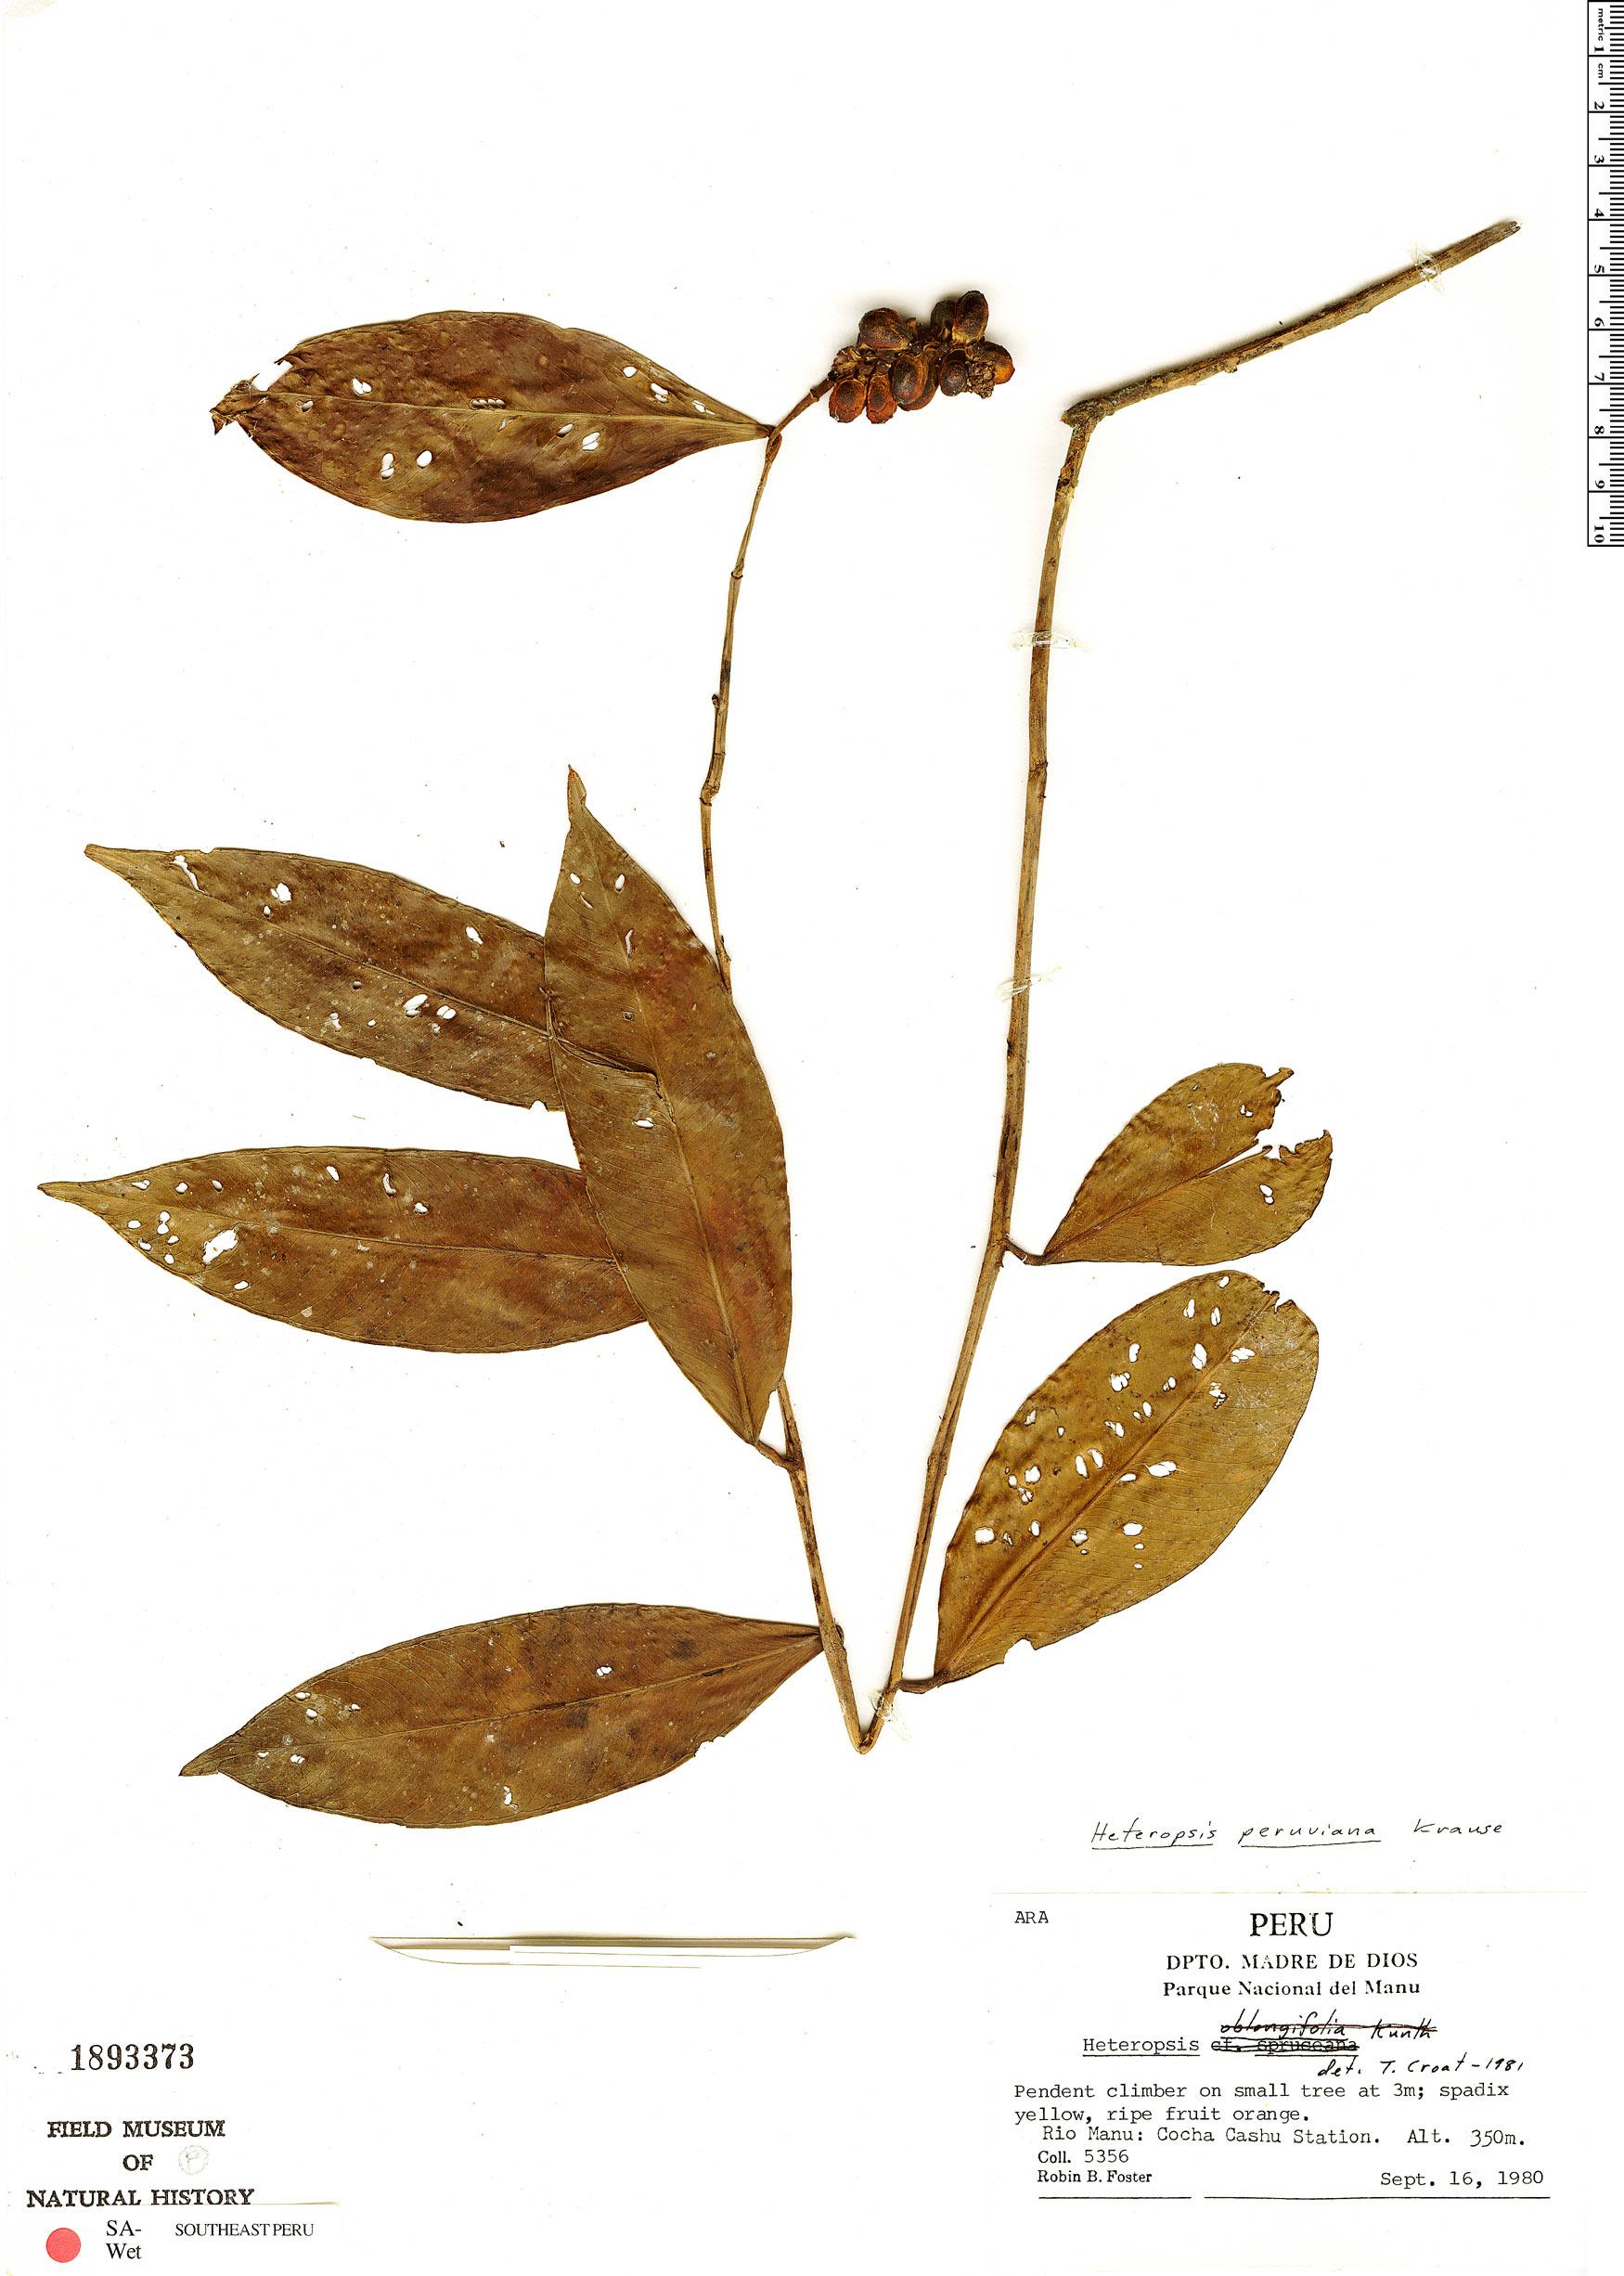 Specimen: Heteropsis peruviana